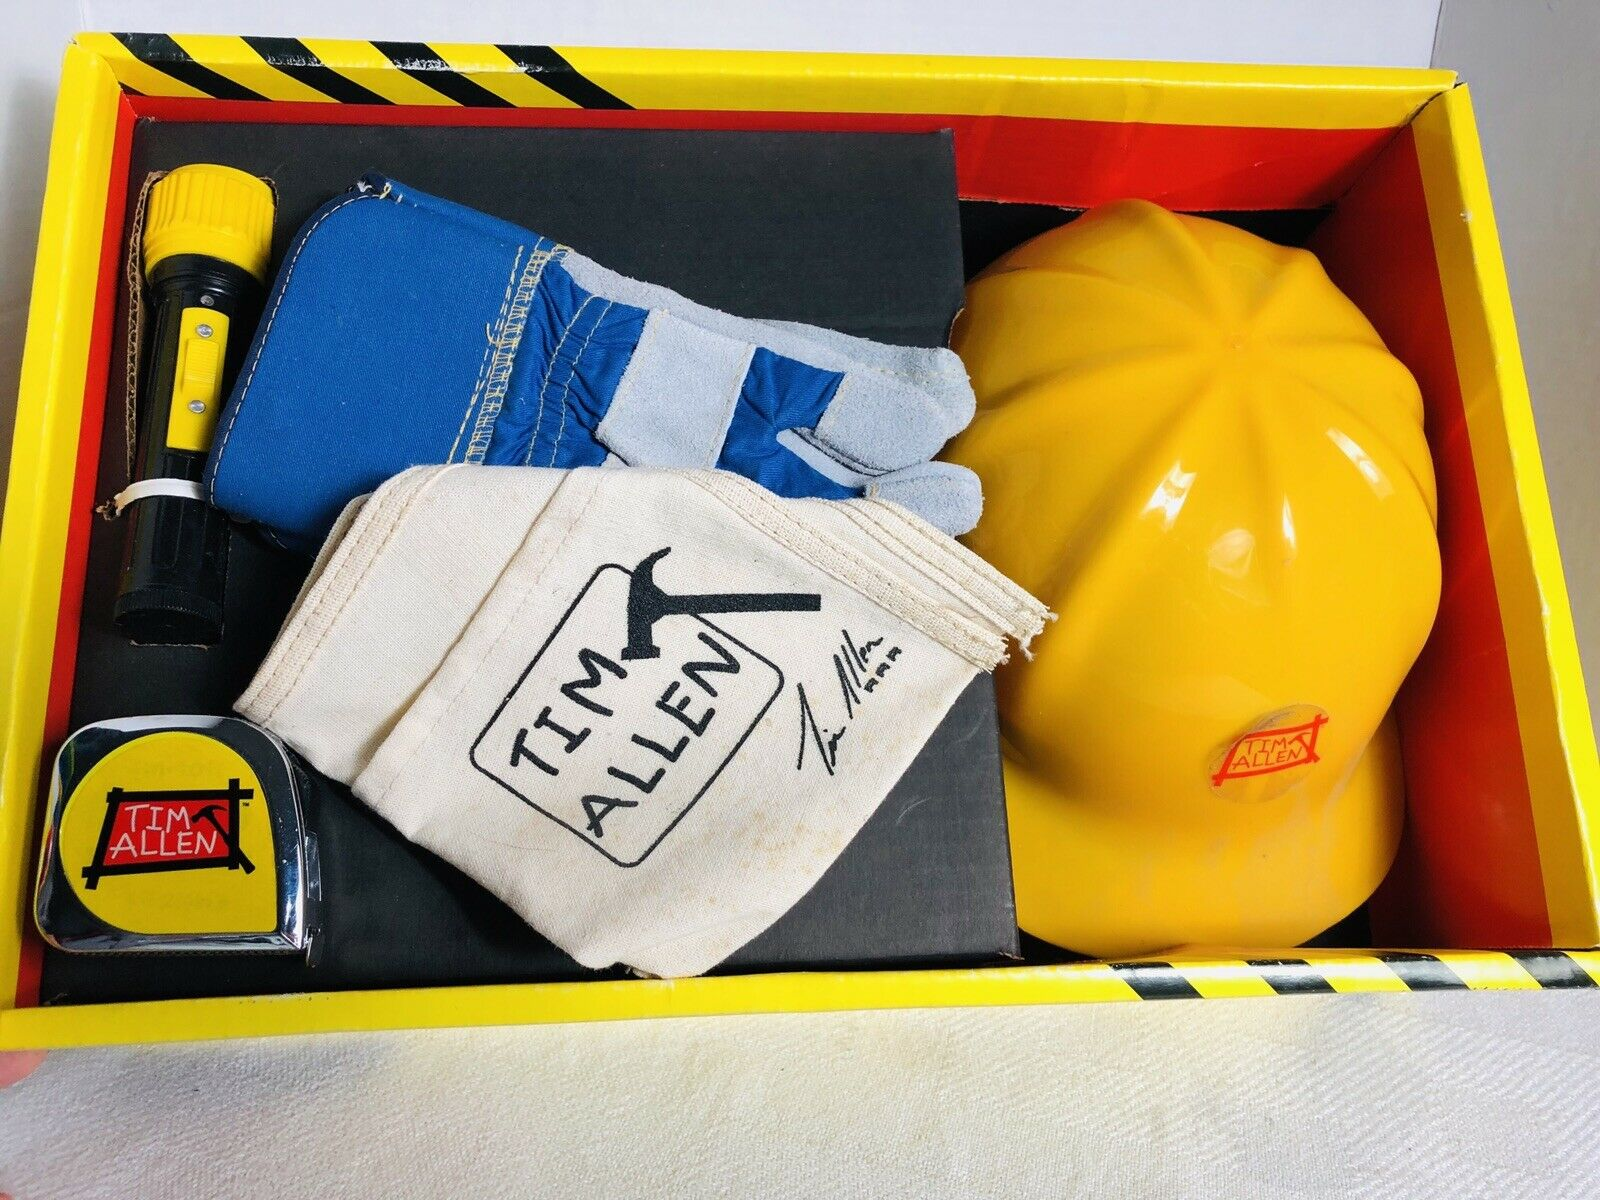 TIM ALLEN - TIM'S LITTLE HELPER Home Improvement Play set Toys 1990s  TOOLS